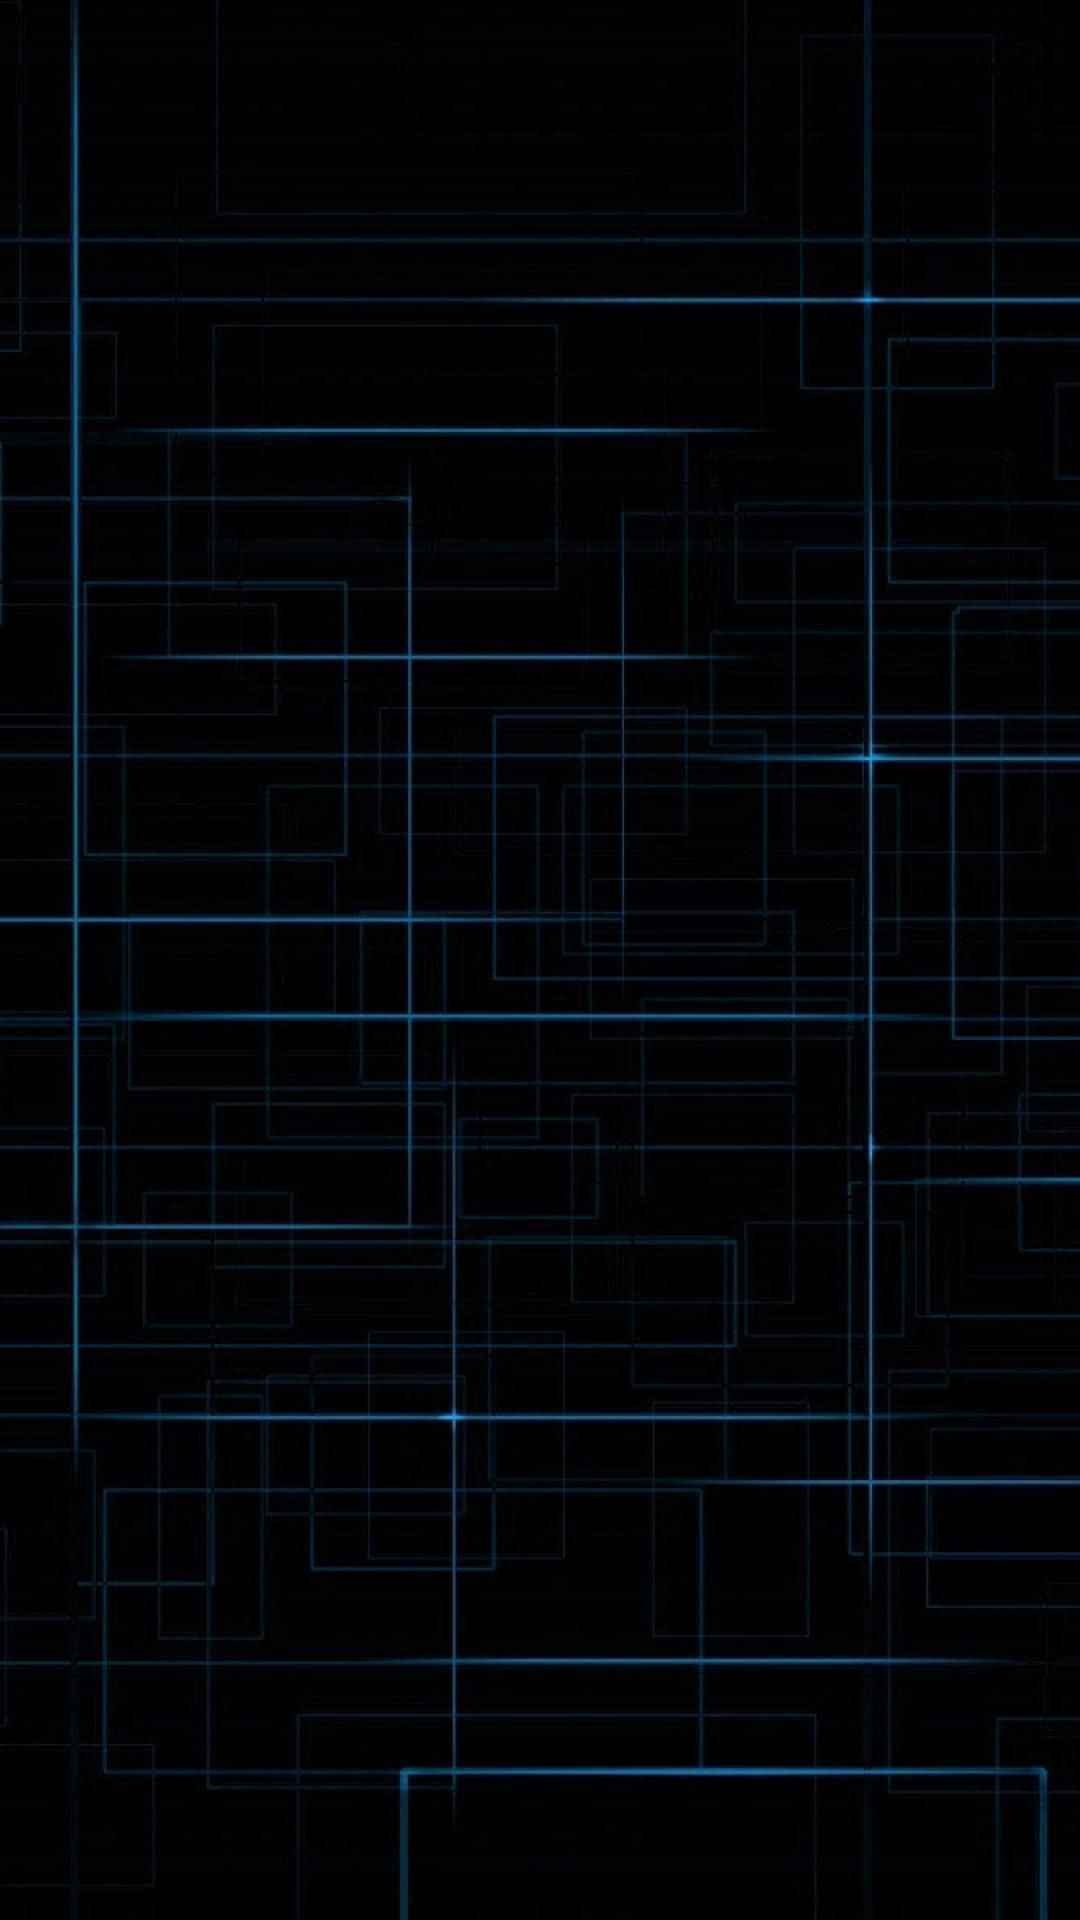 Black And White Geometric Wallpaper Dark Phone Wallpaper Hd Pixelstalk Net